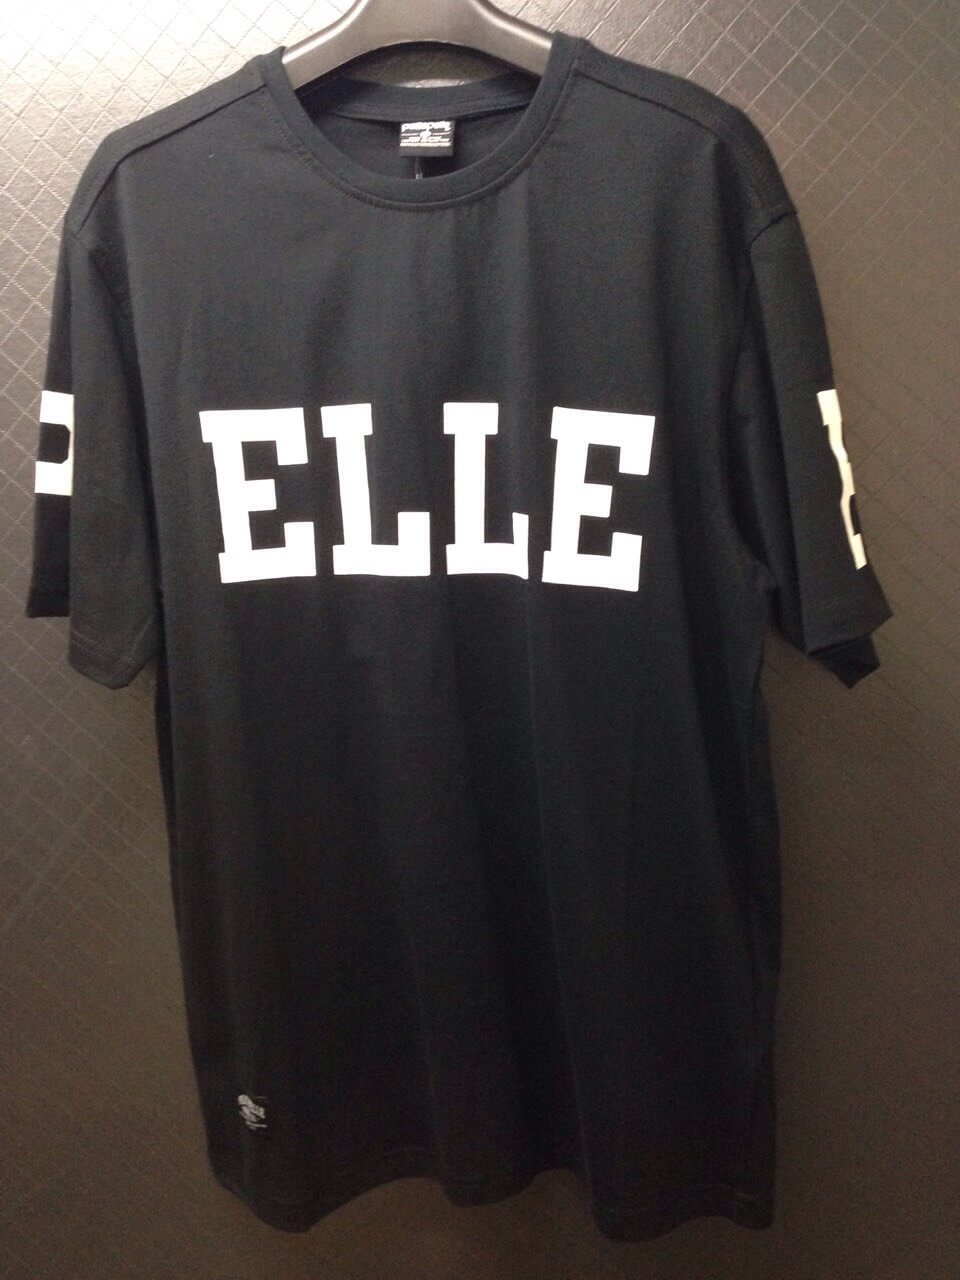 pelle_t-shirts-b01